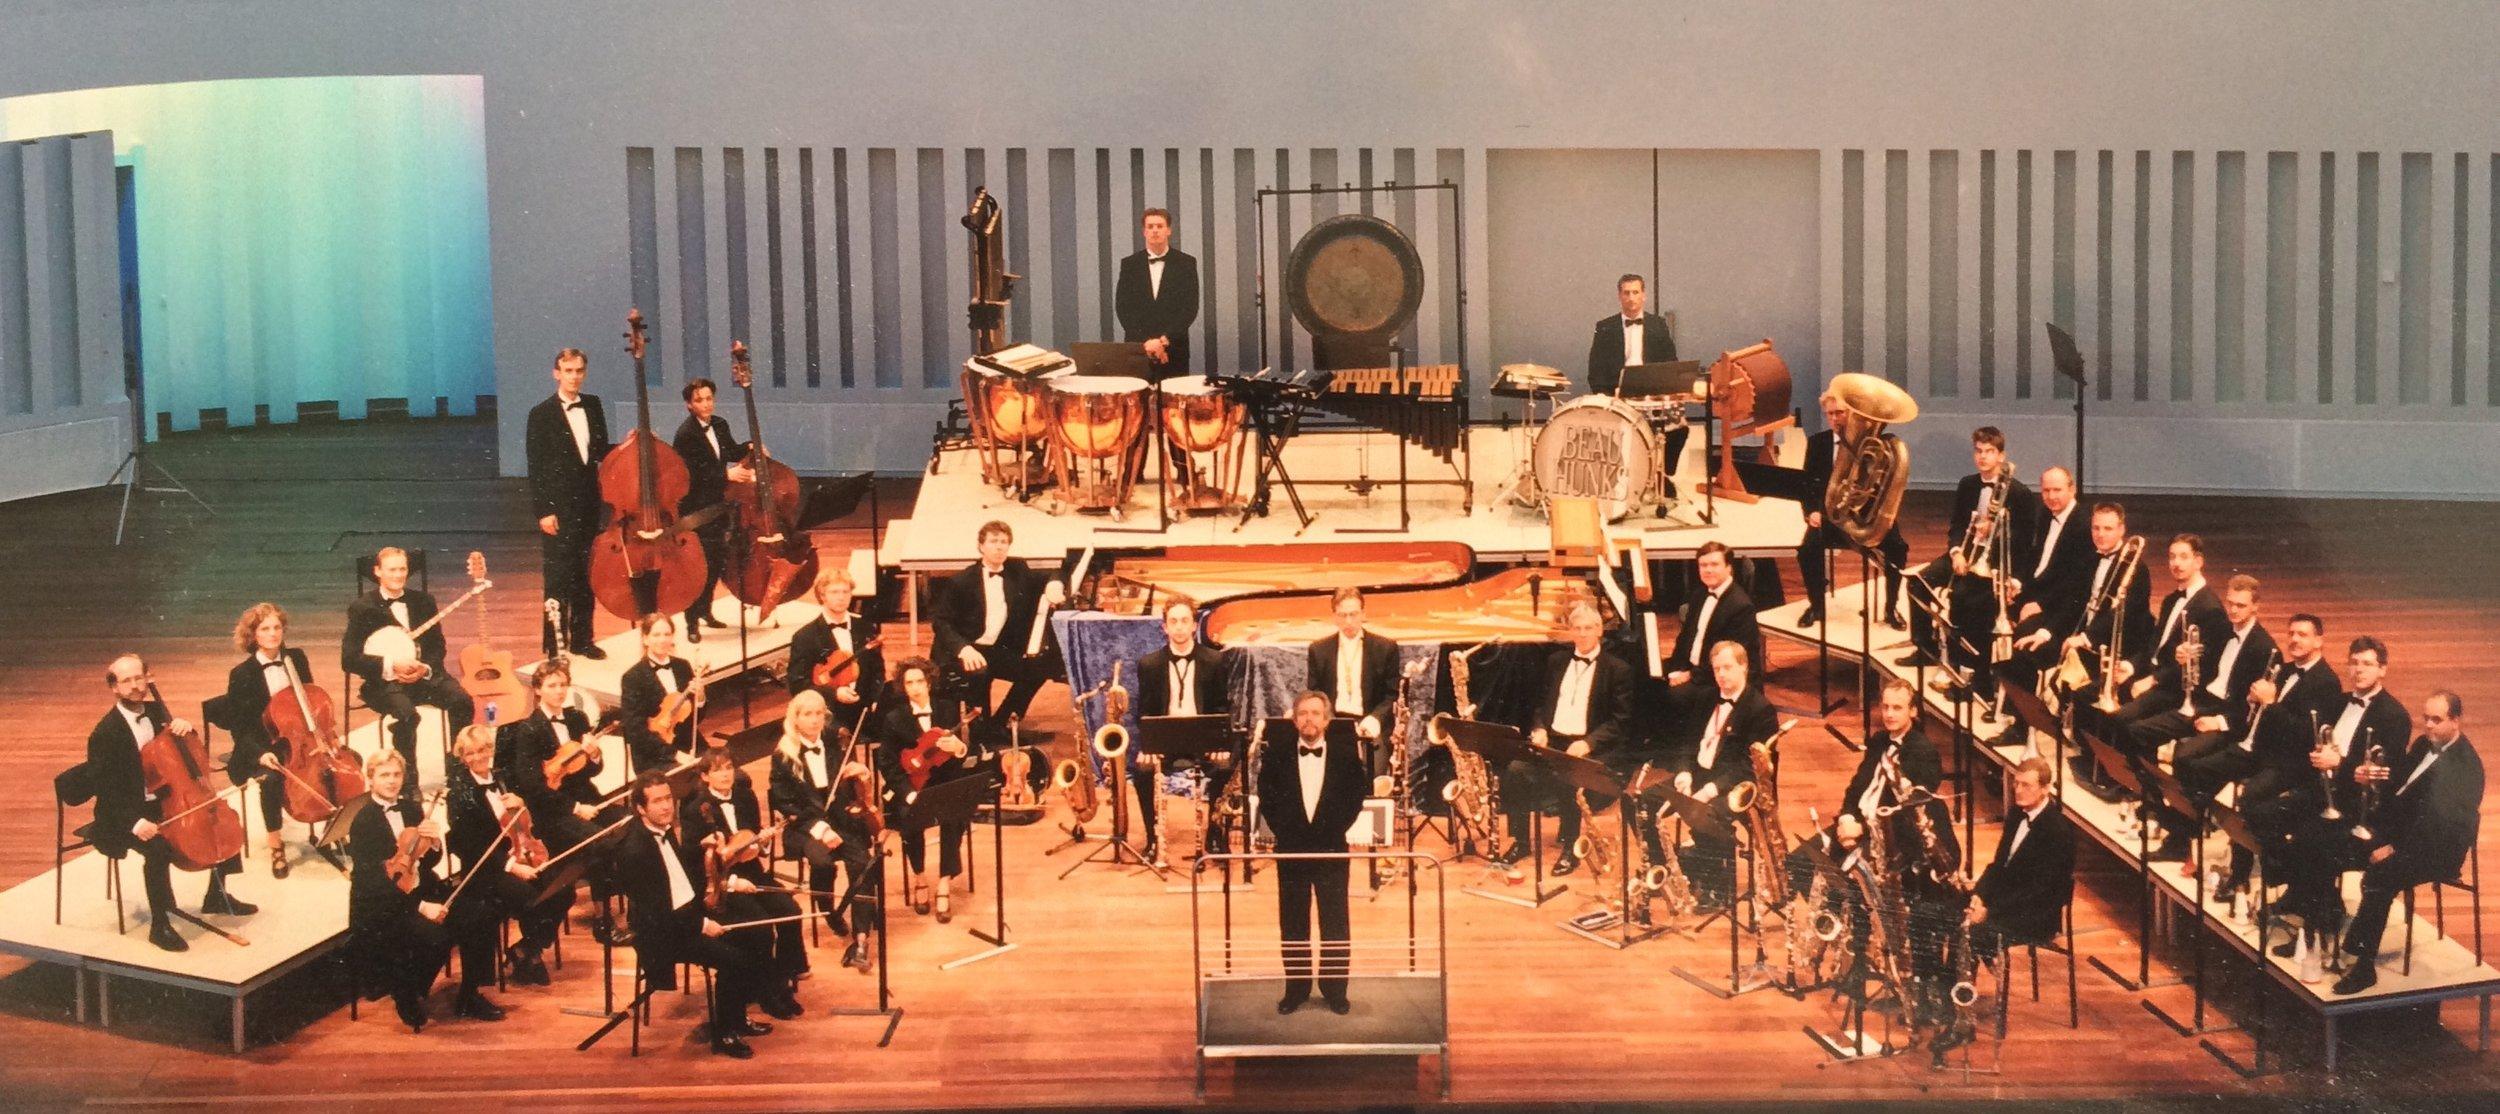 Grofé Orkest Tilburg.jpg